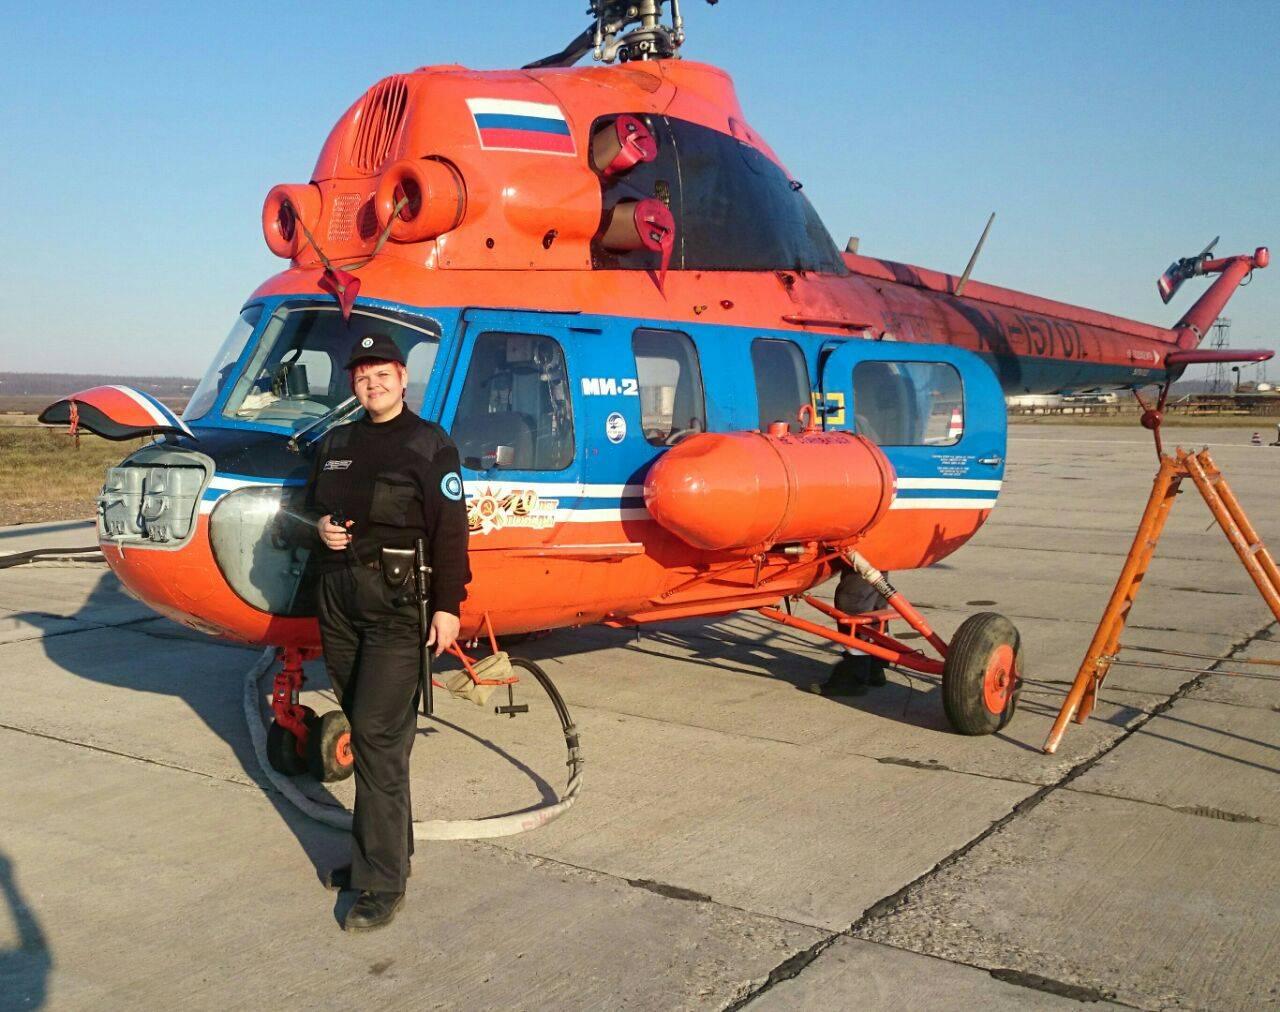 МИ-2 photo Анатолий